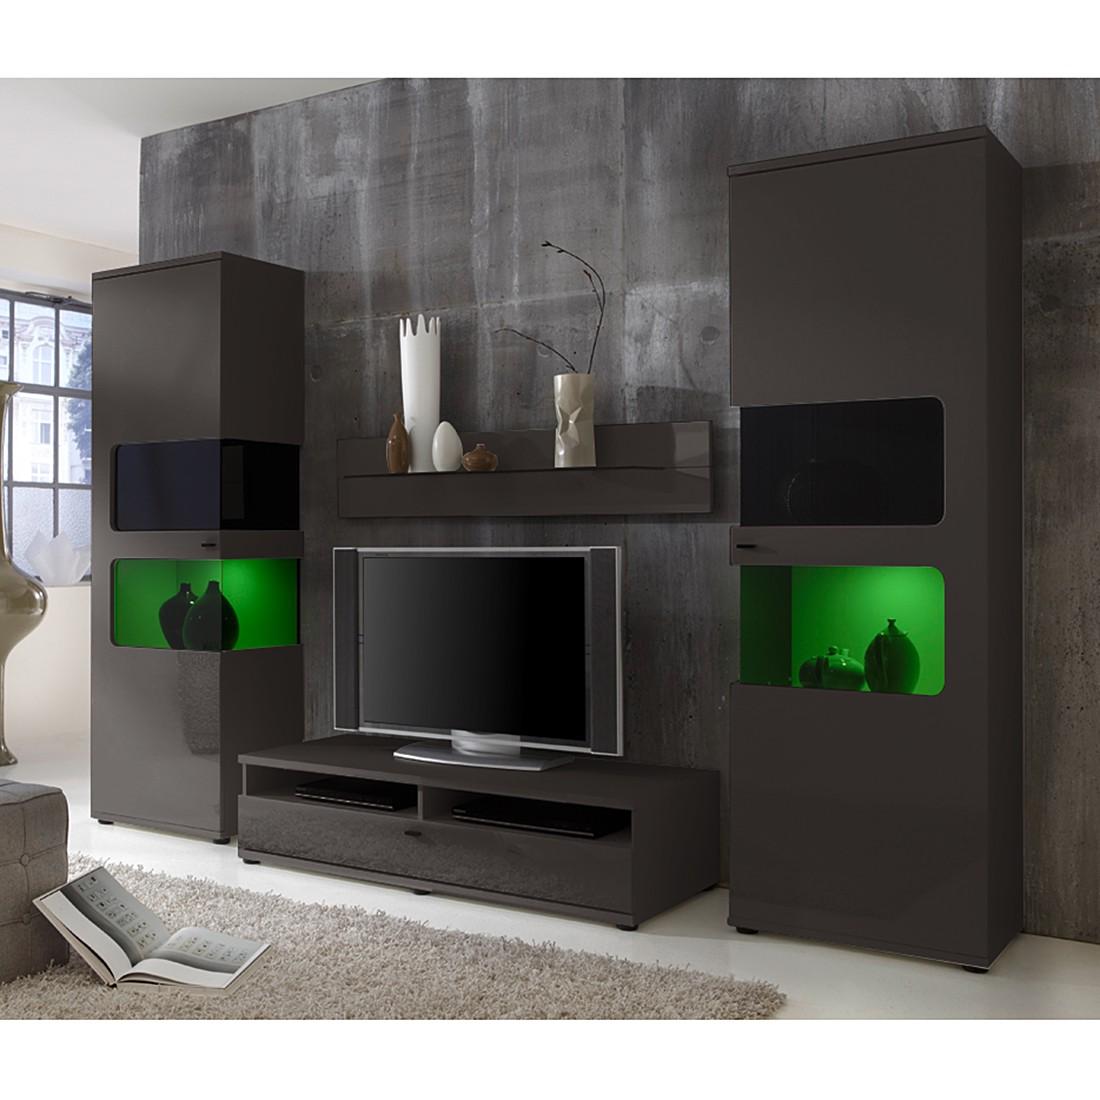 wohnwand monk ii 4 teilig grau roomscape bestellen. Black Bedroom Furniture Sets. Home Design Ideas